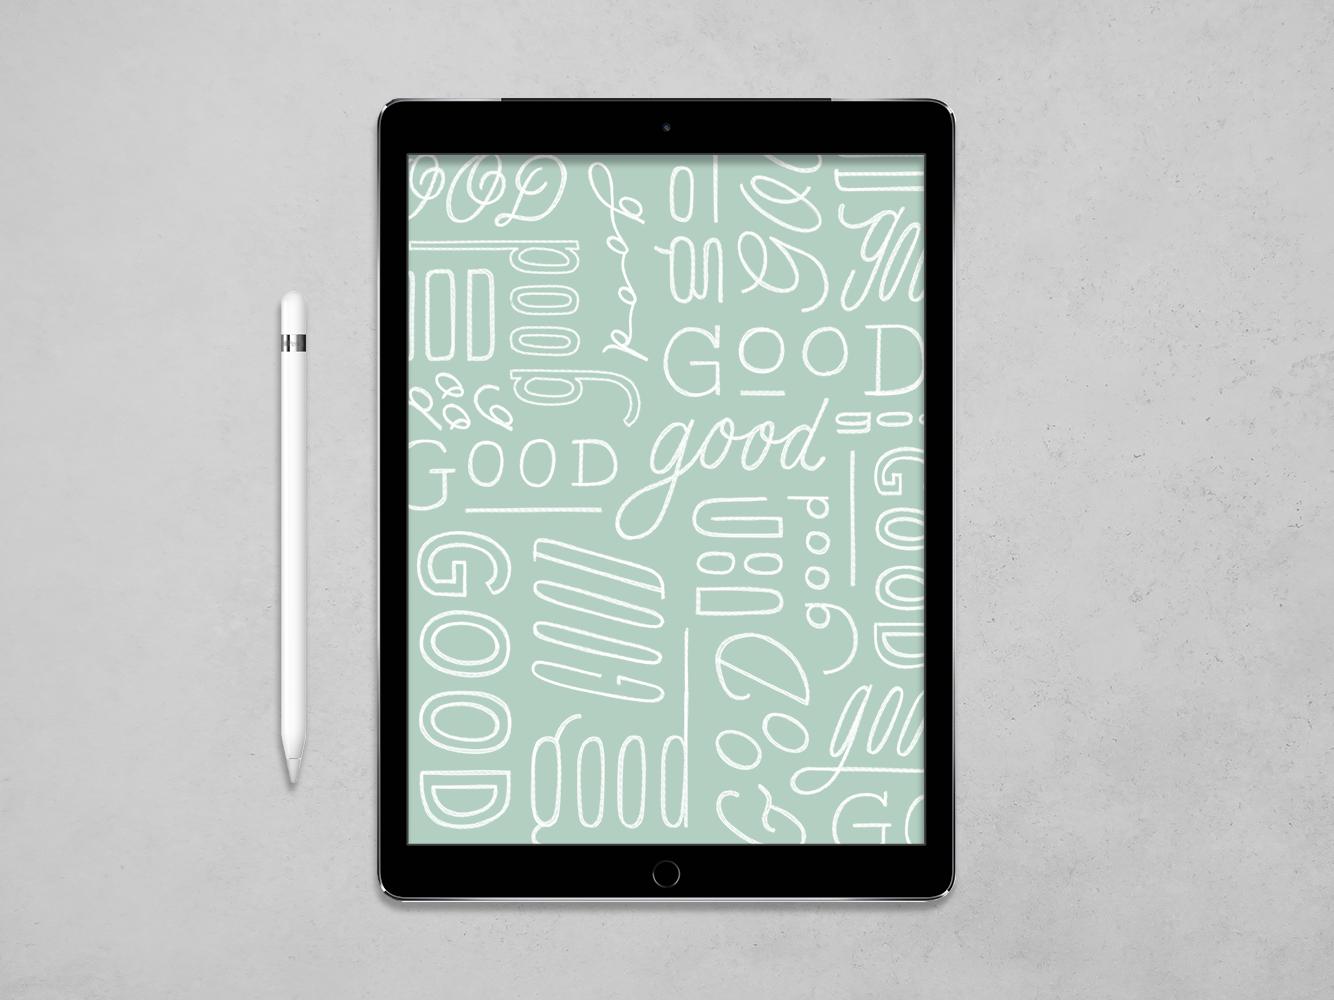 More Good Stuff pattern ipad letters handlettering procreate design type illustration typography lettering